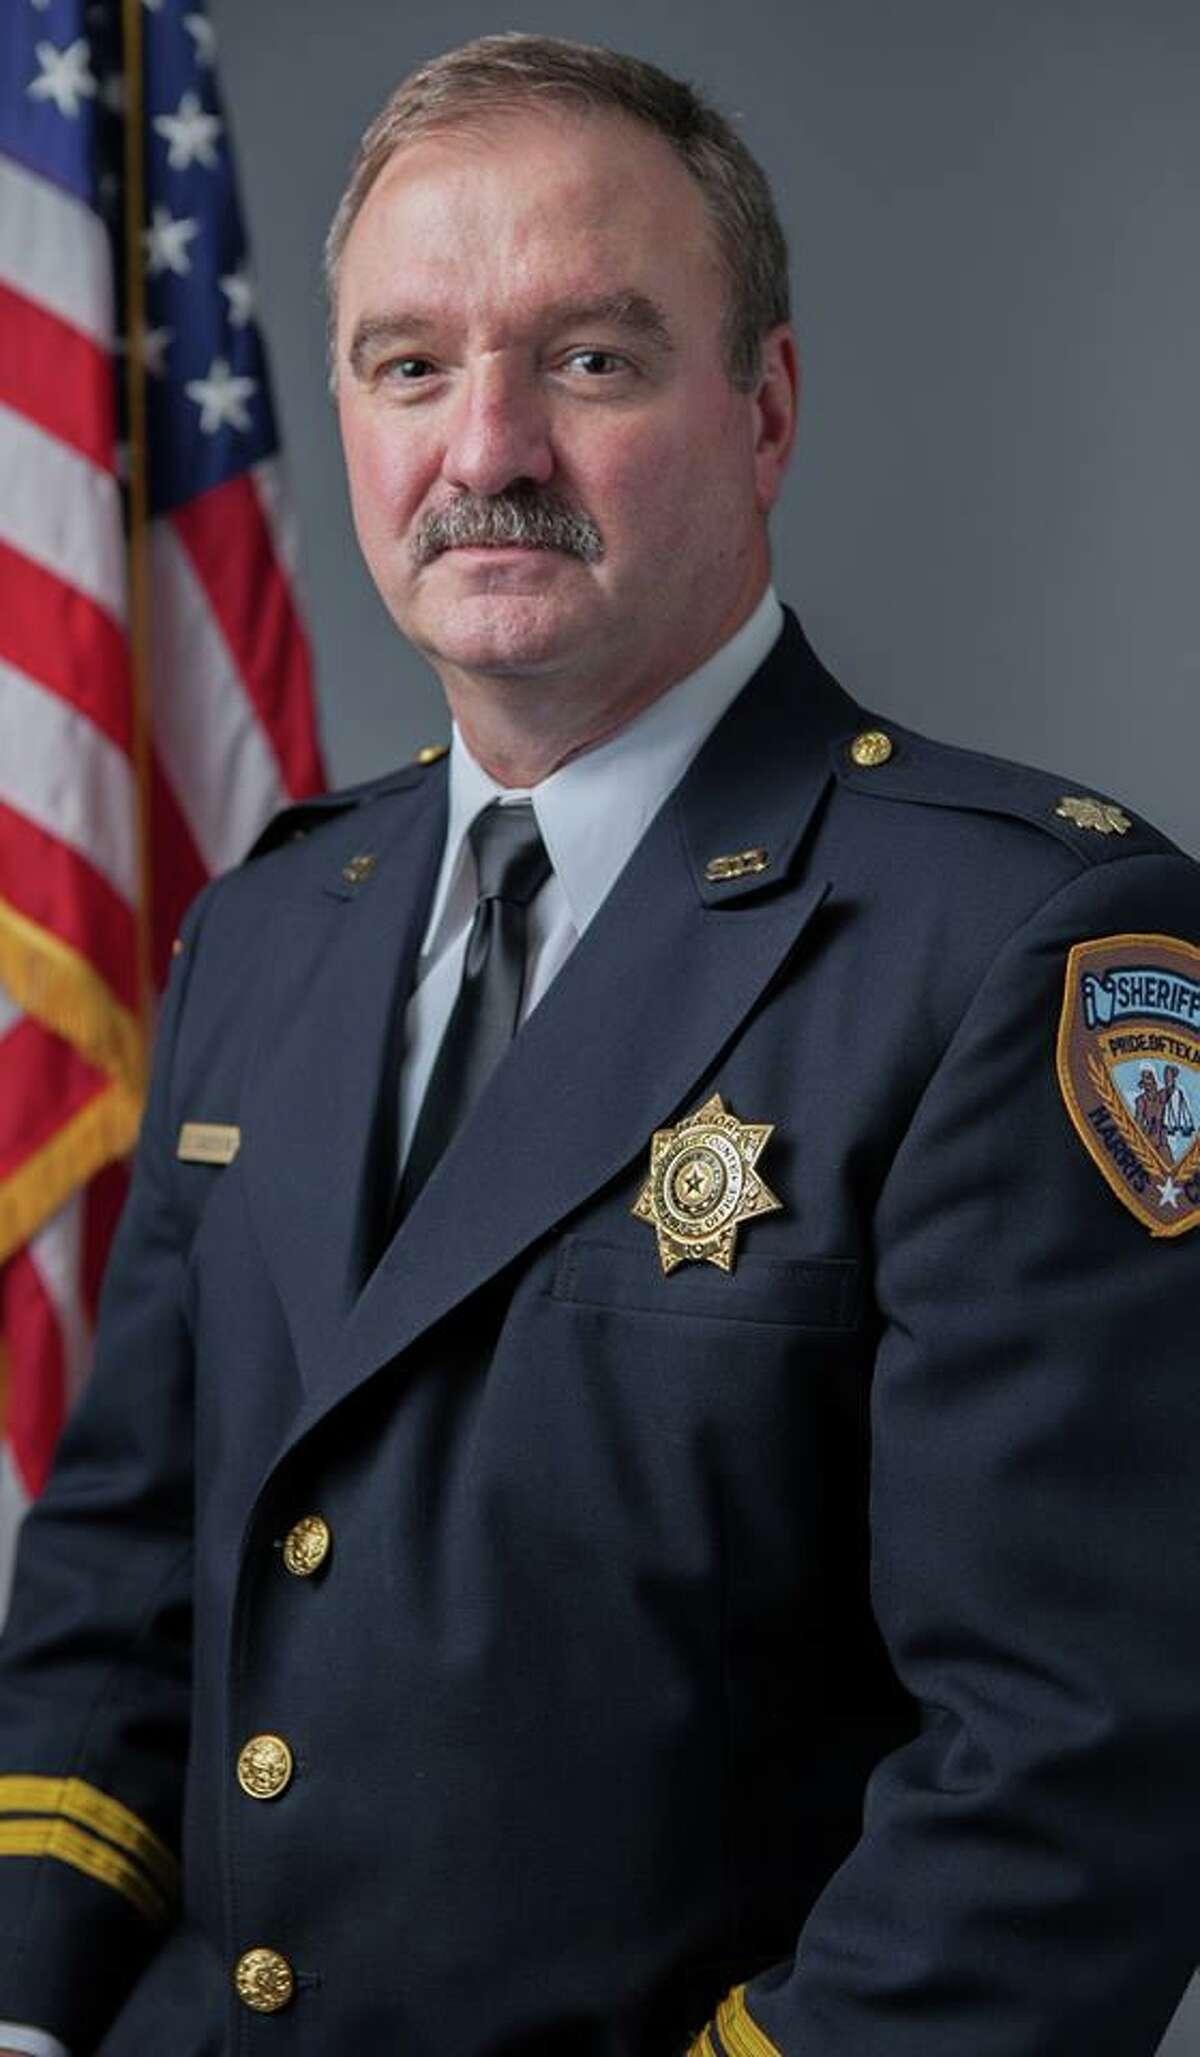 Precinct 3 Assistant Chief Deputy Clint Greenwood